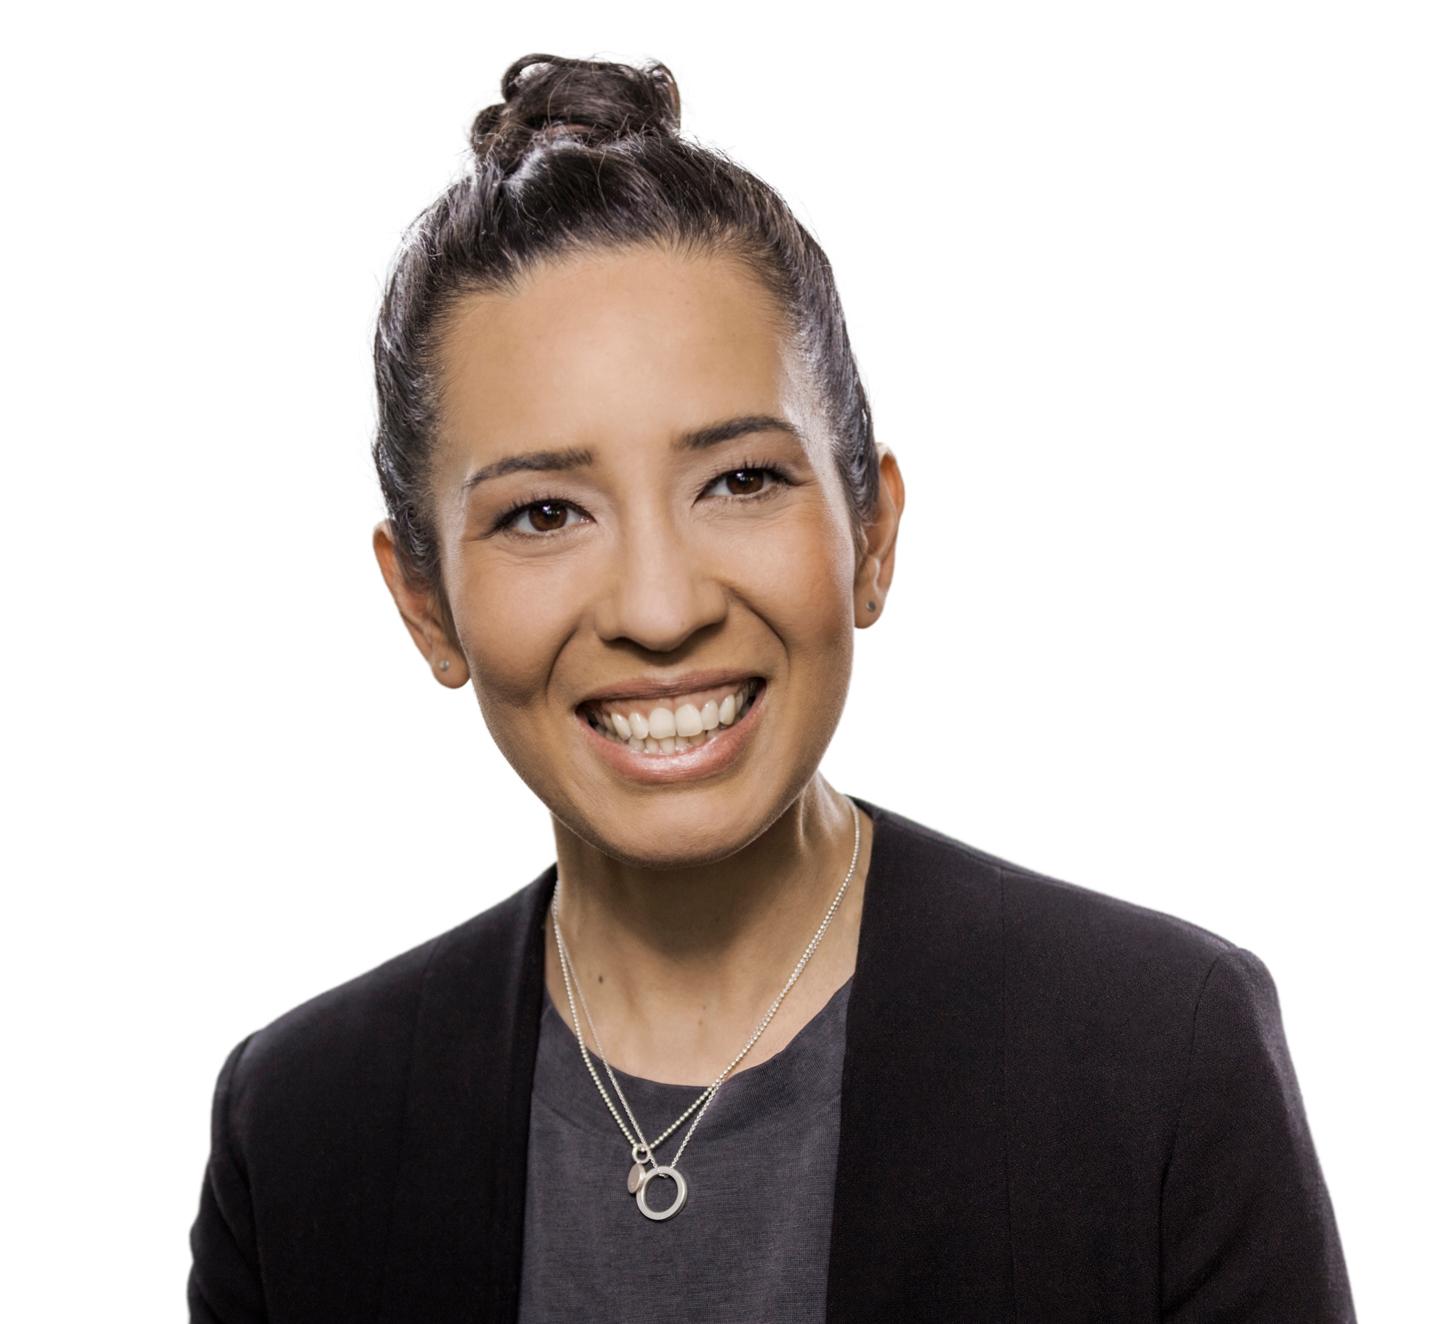 Sandra Burkert